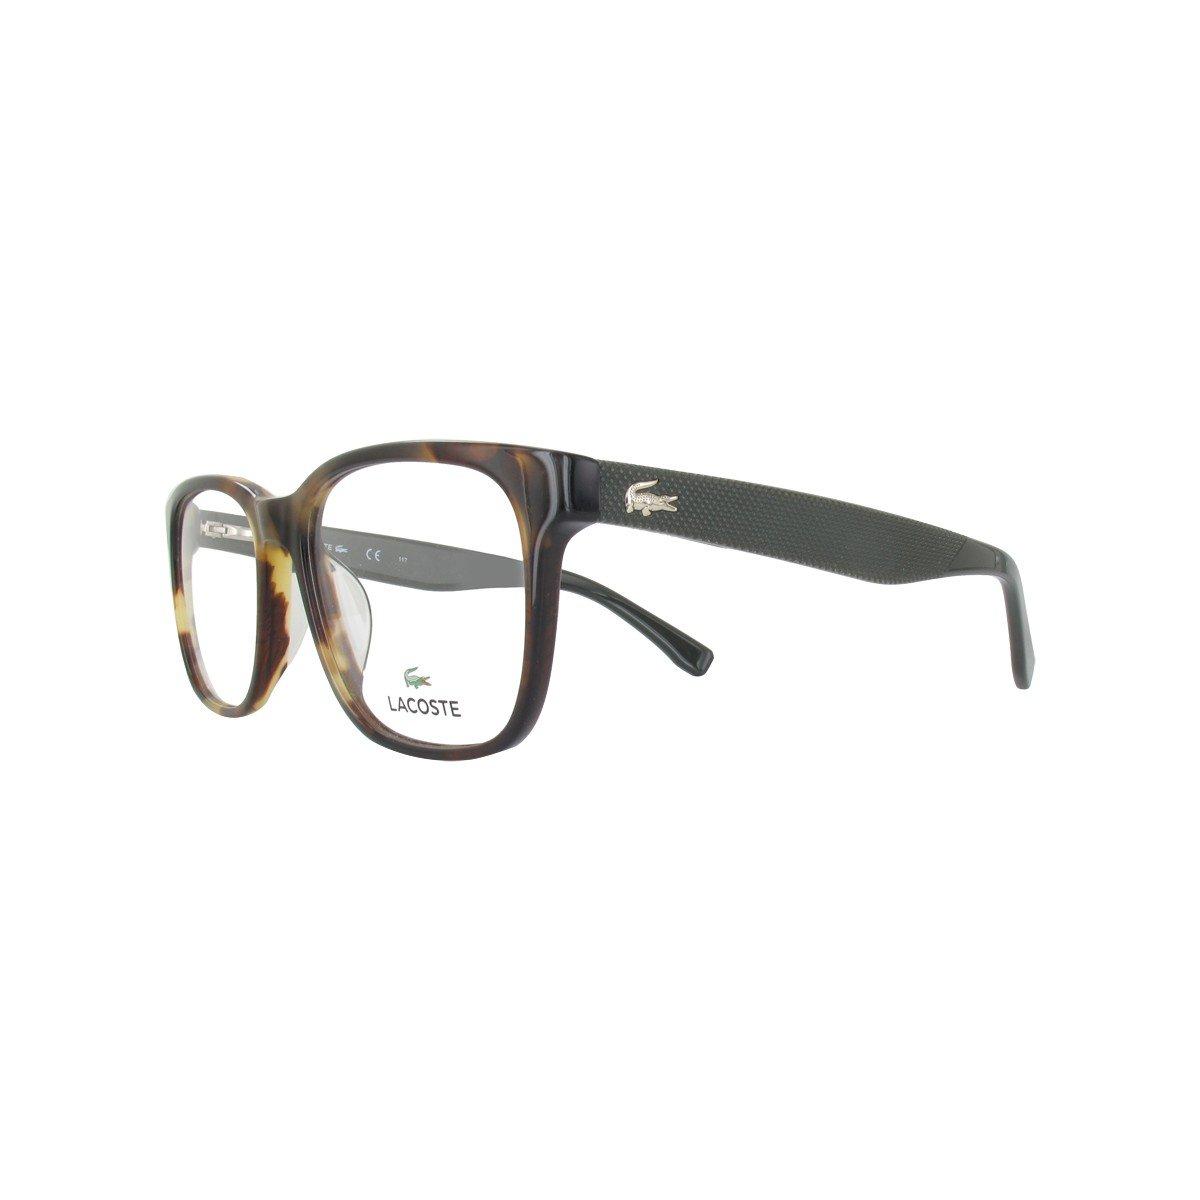 Lacoste Brillengestelle L2769 Monturas de gafas Marr/ón Braun 54.0 para Hombre